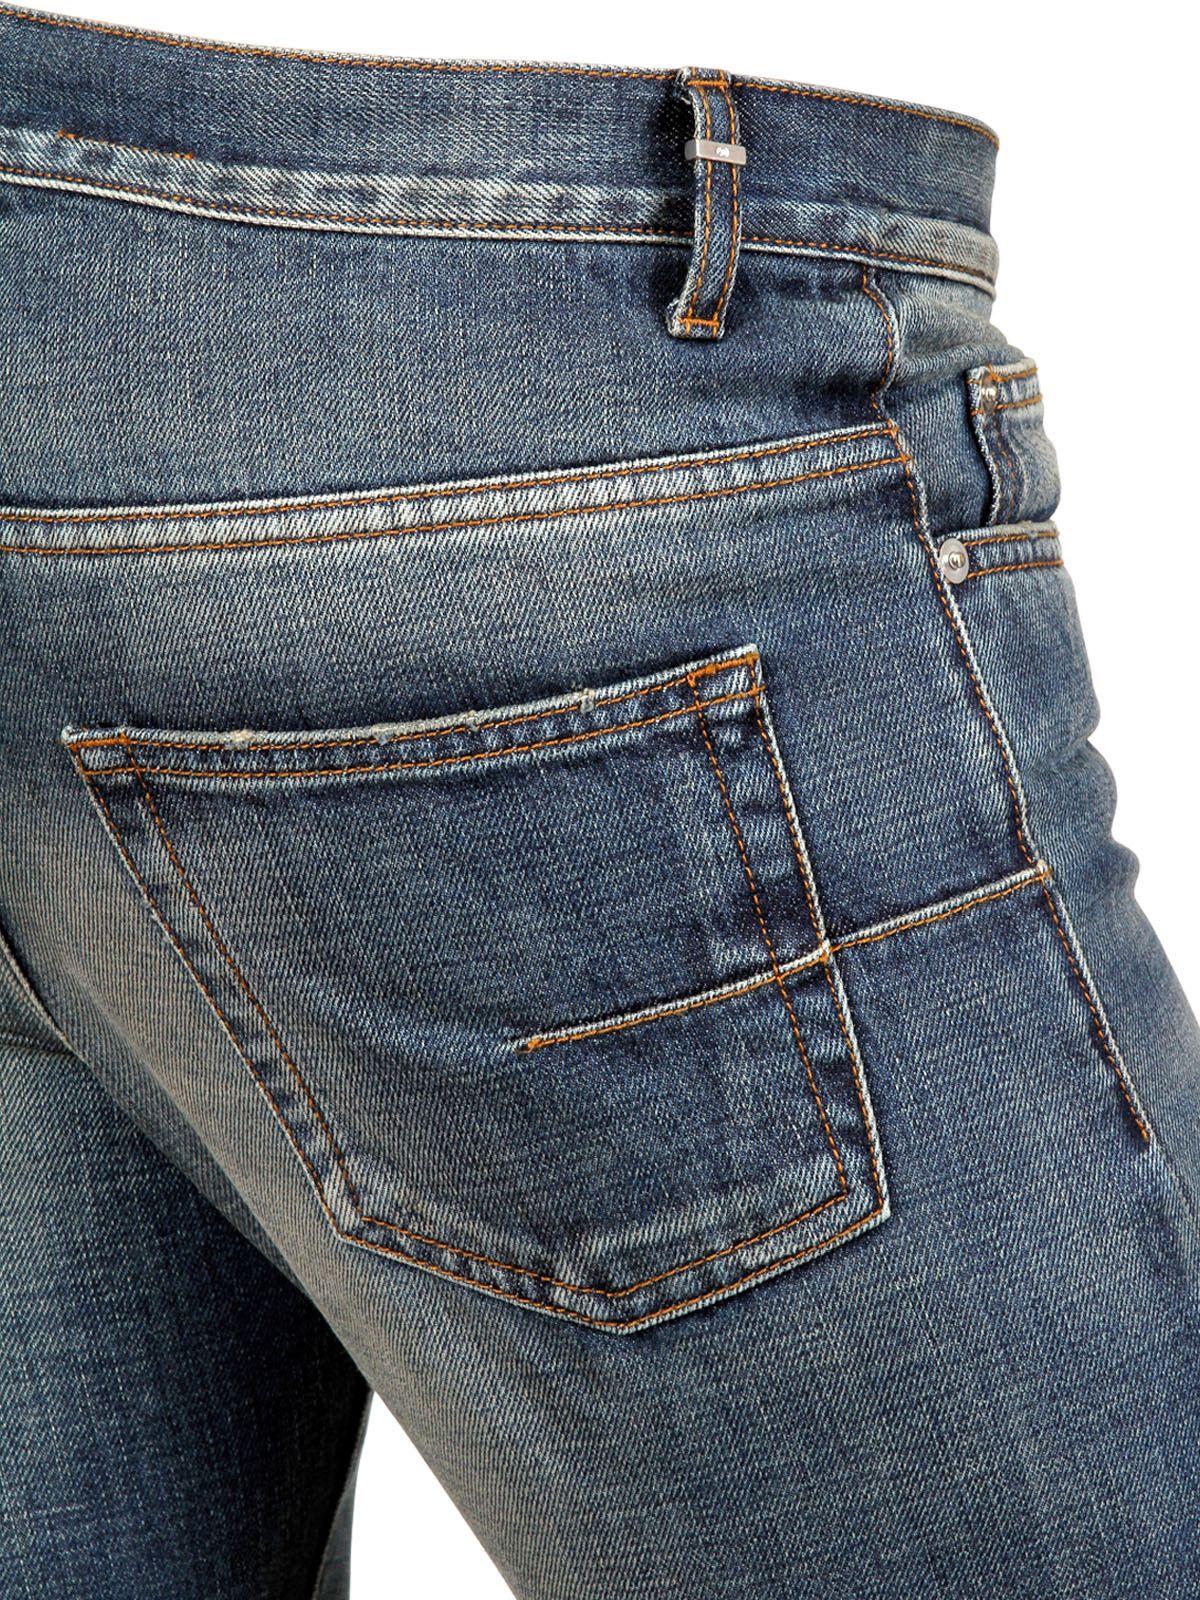 dior homme 19cm heavy seas denim jeans in blue for men lyst. Black Bedroom Furniture Sets. Home Design Ideas